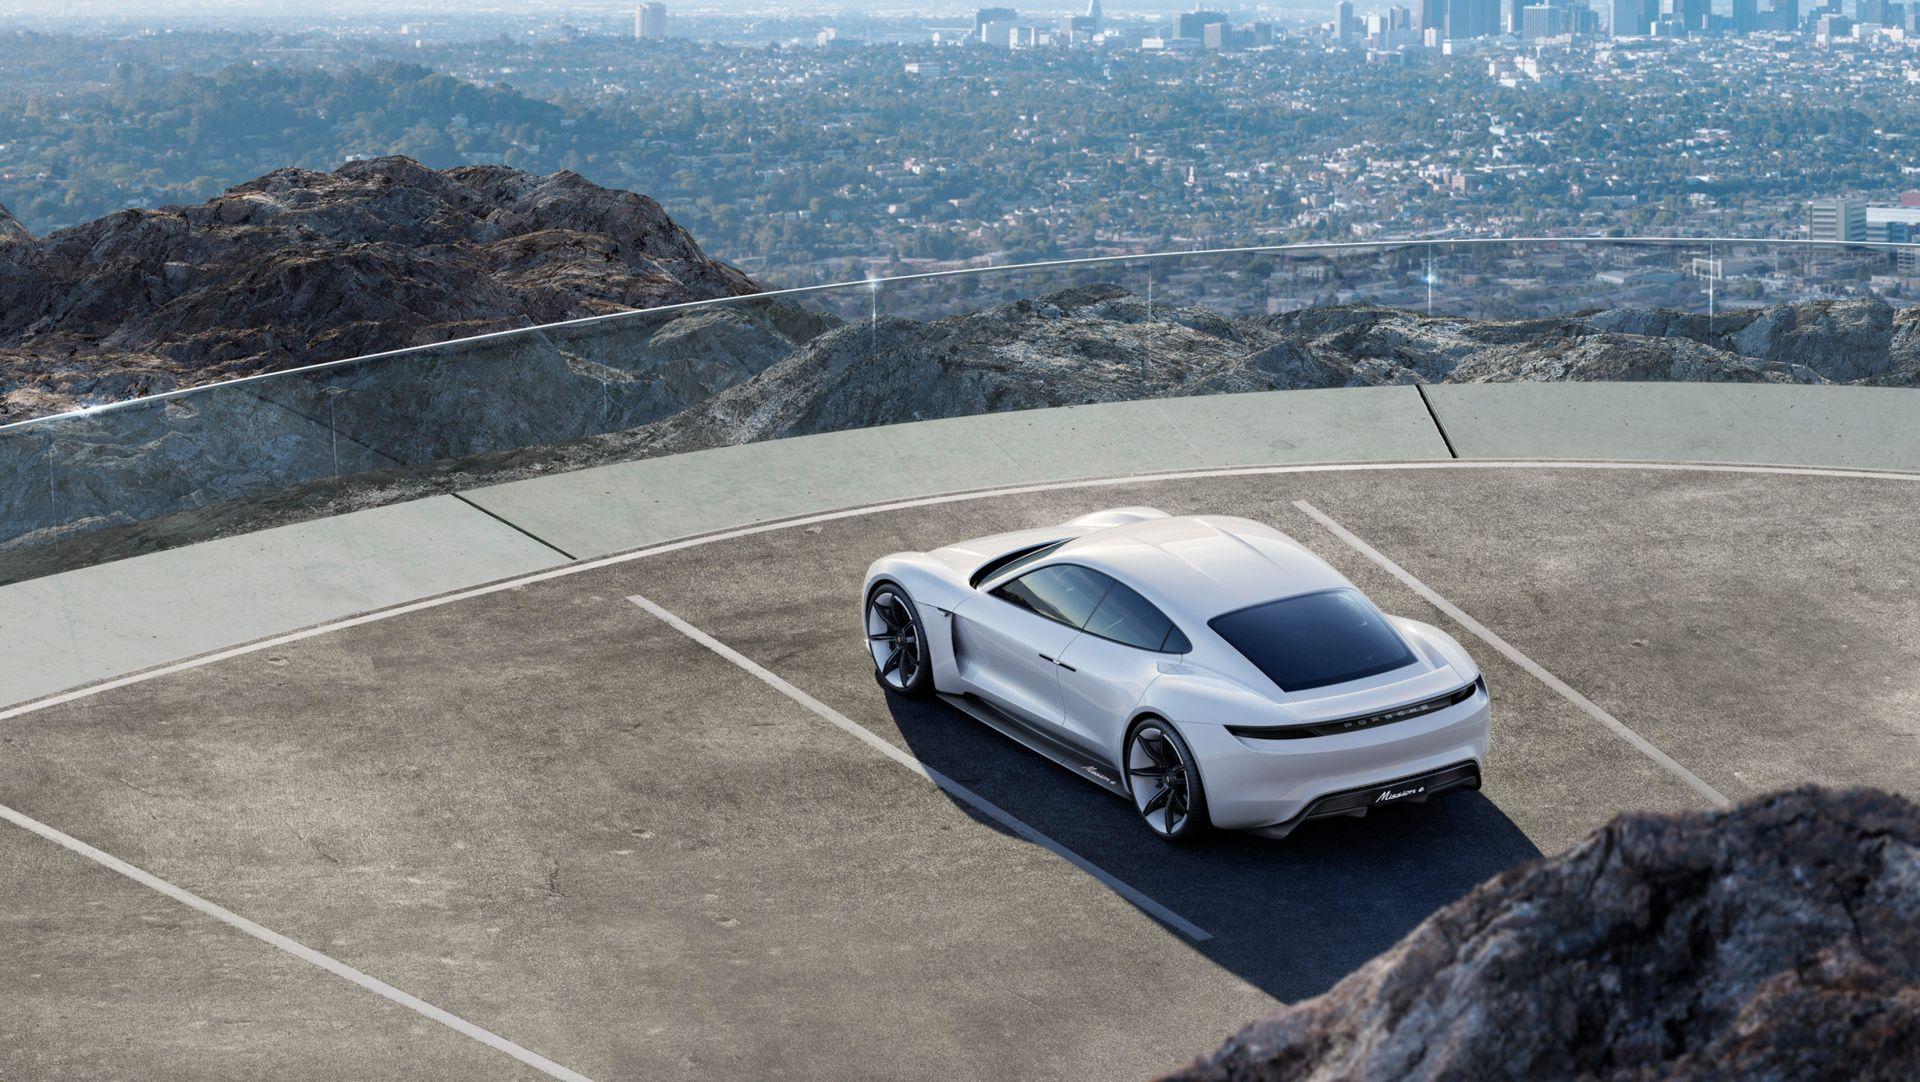 Porsche Taycan se apropie de debut: Va primi și un frate SUV